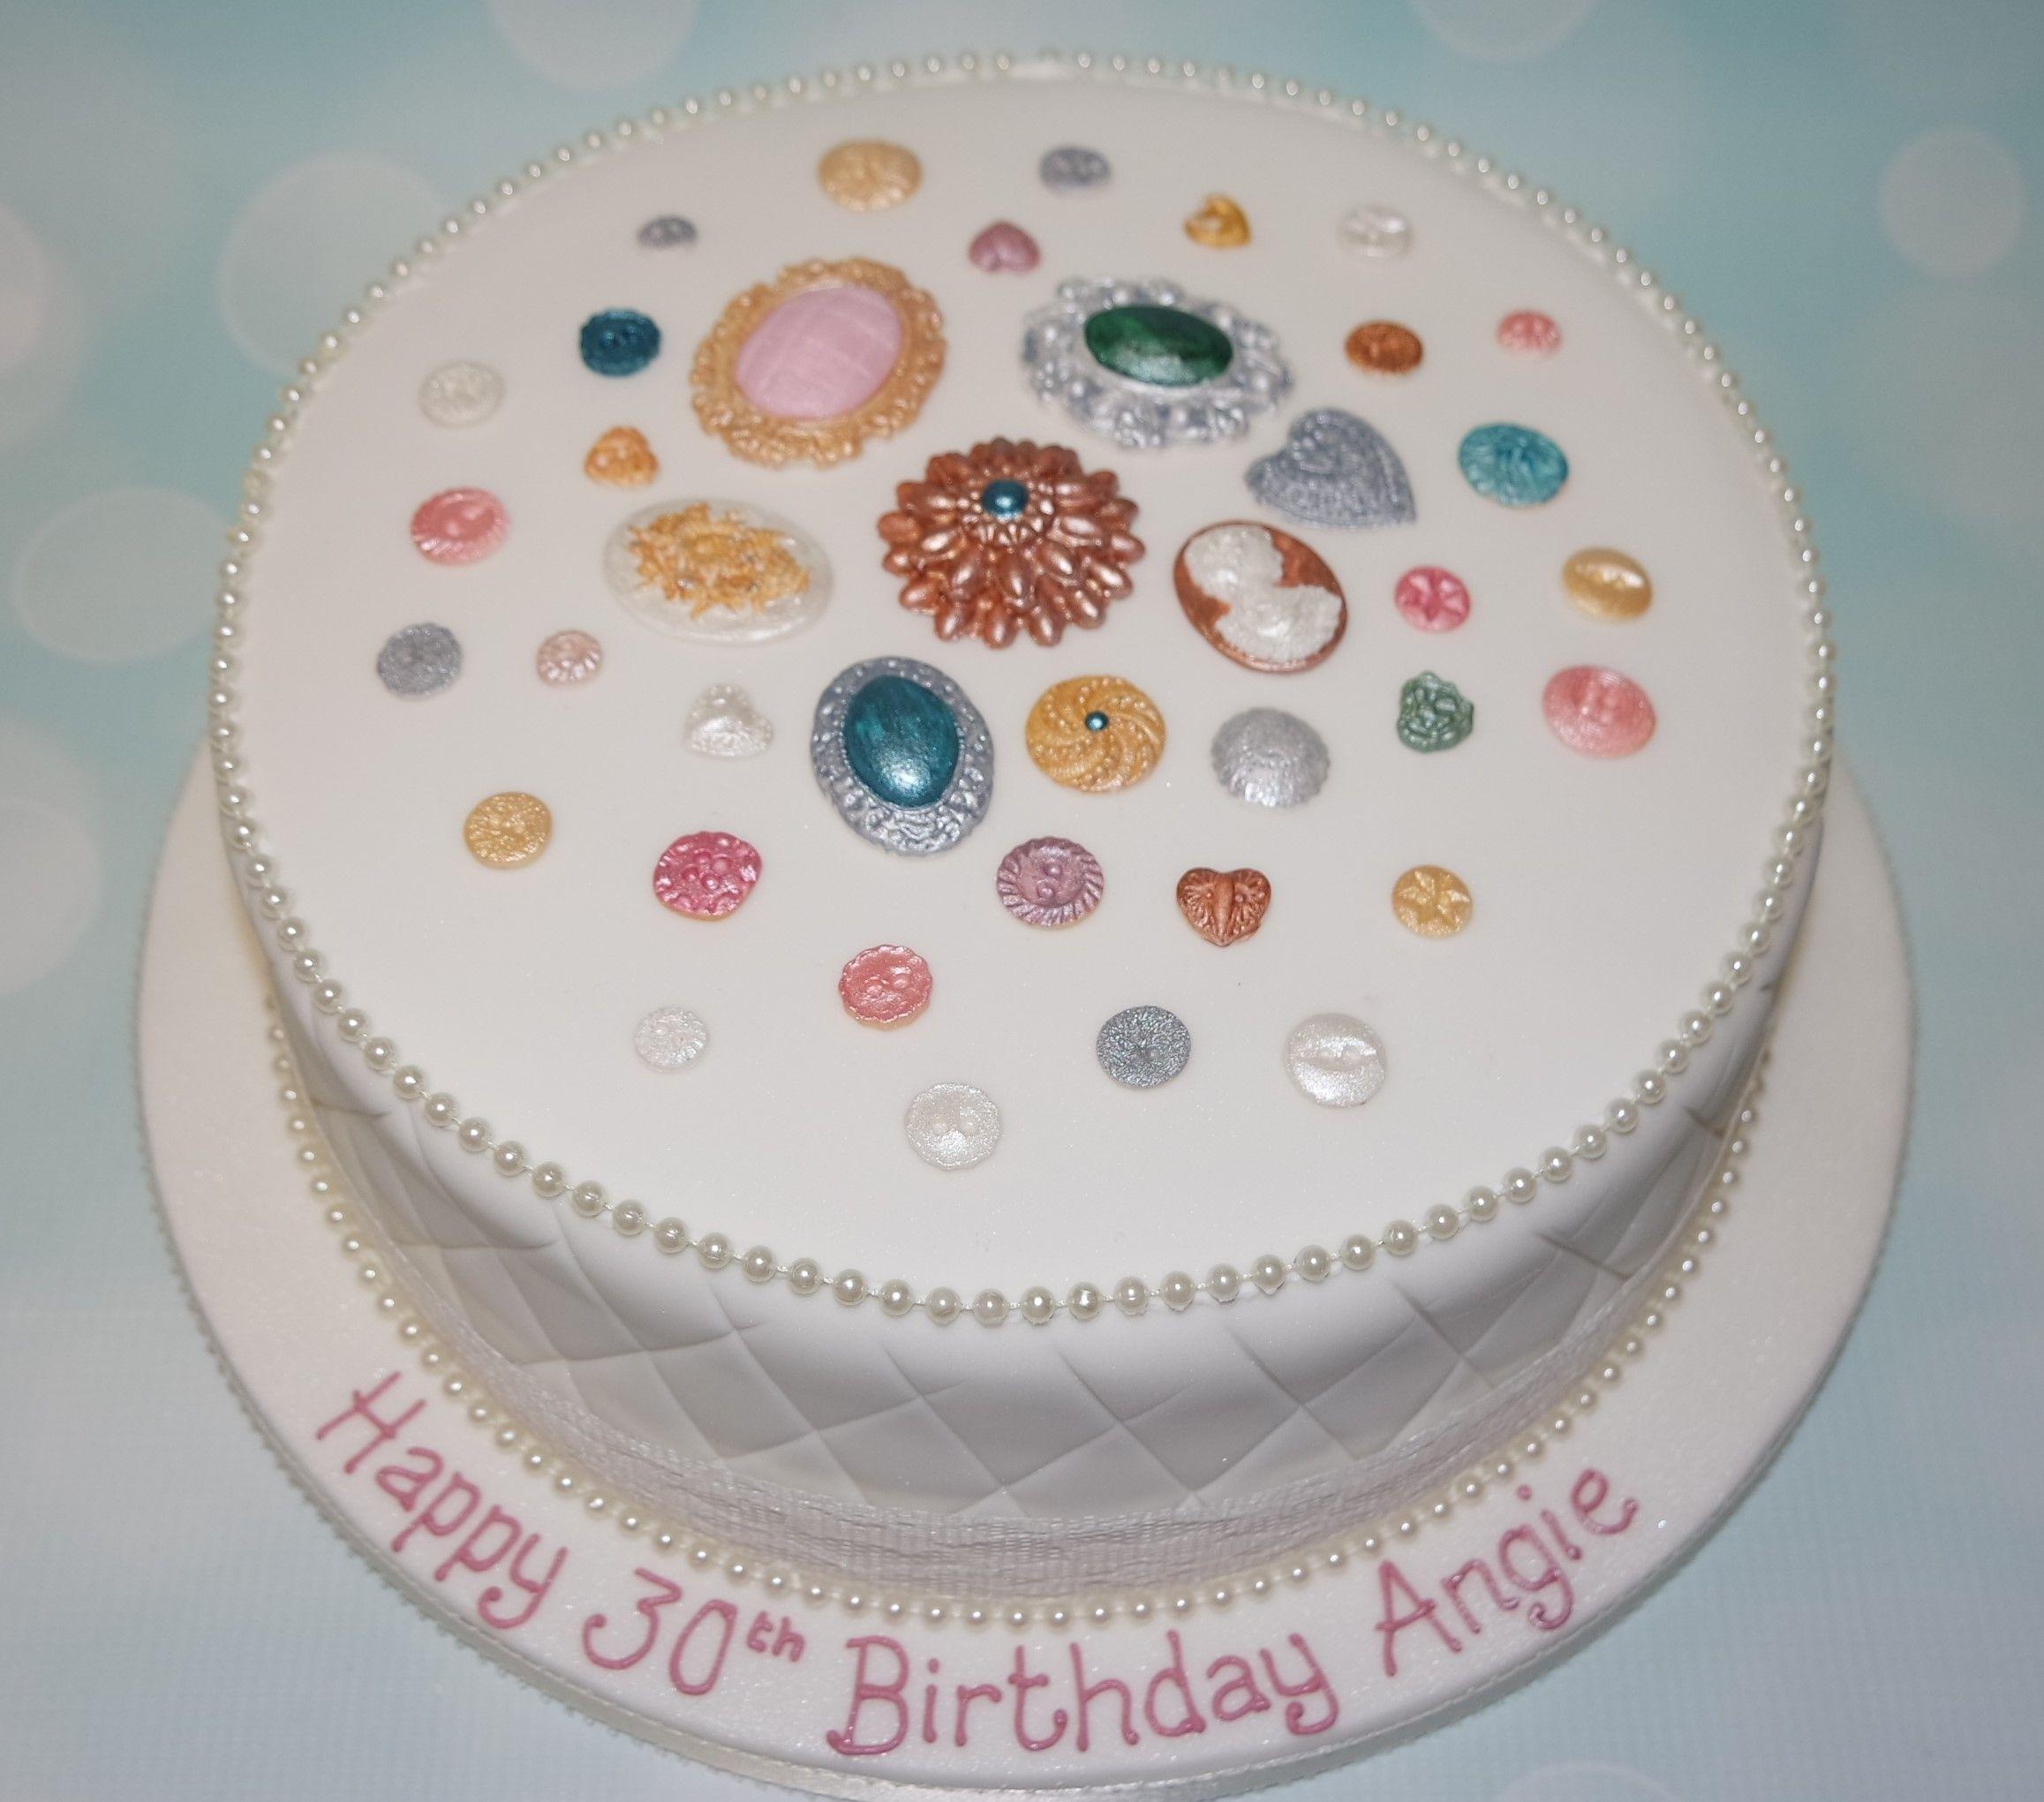 Such An Elegant 30th Birthday Cake Birthday Cakes Pinterest